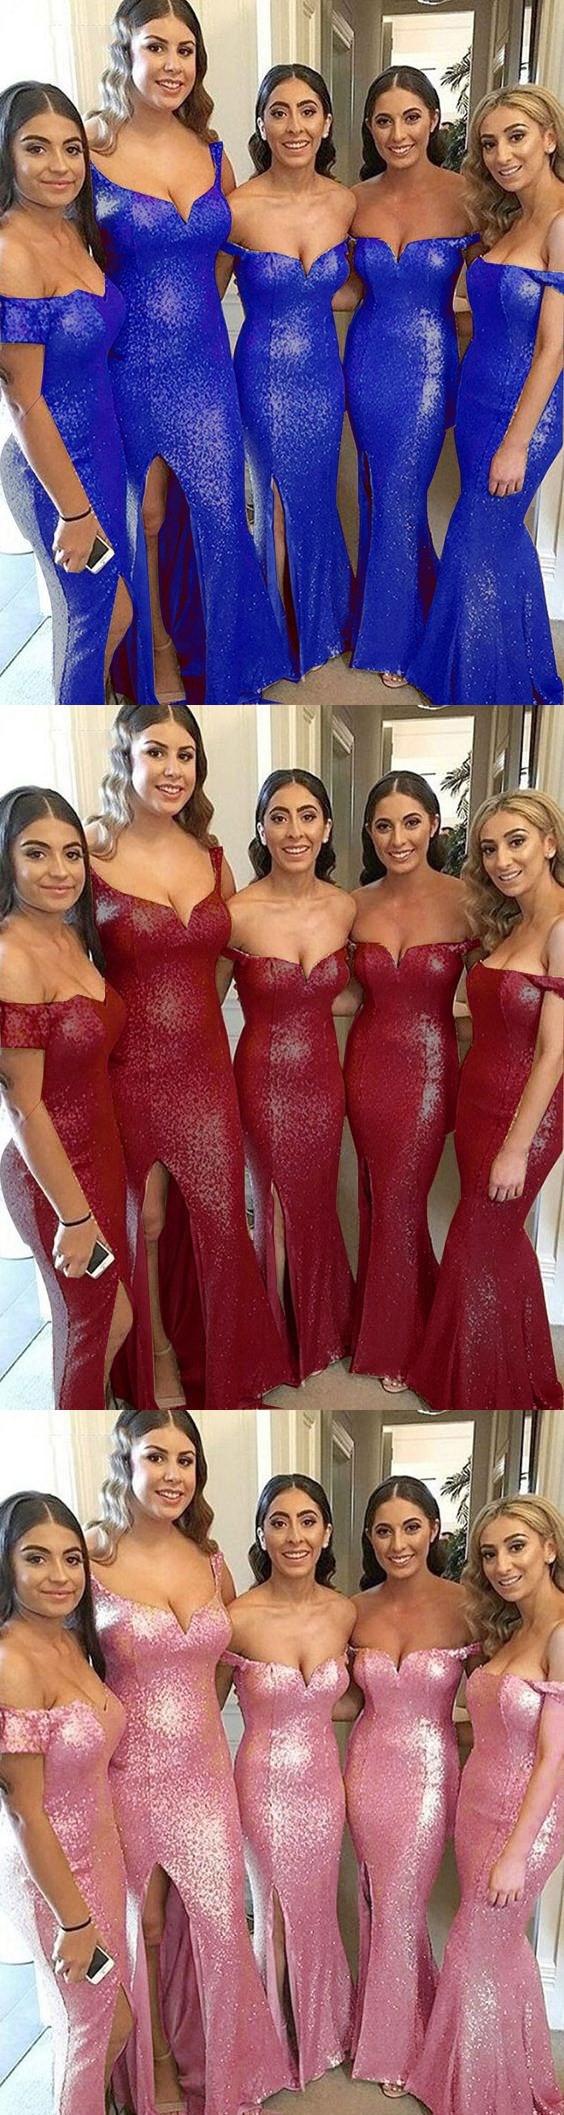 Sequined Long Women Formal Bridesmaid Dresses Mermaid Long Slit